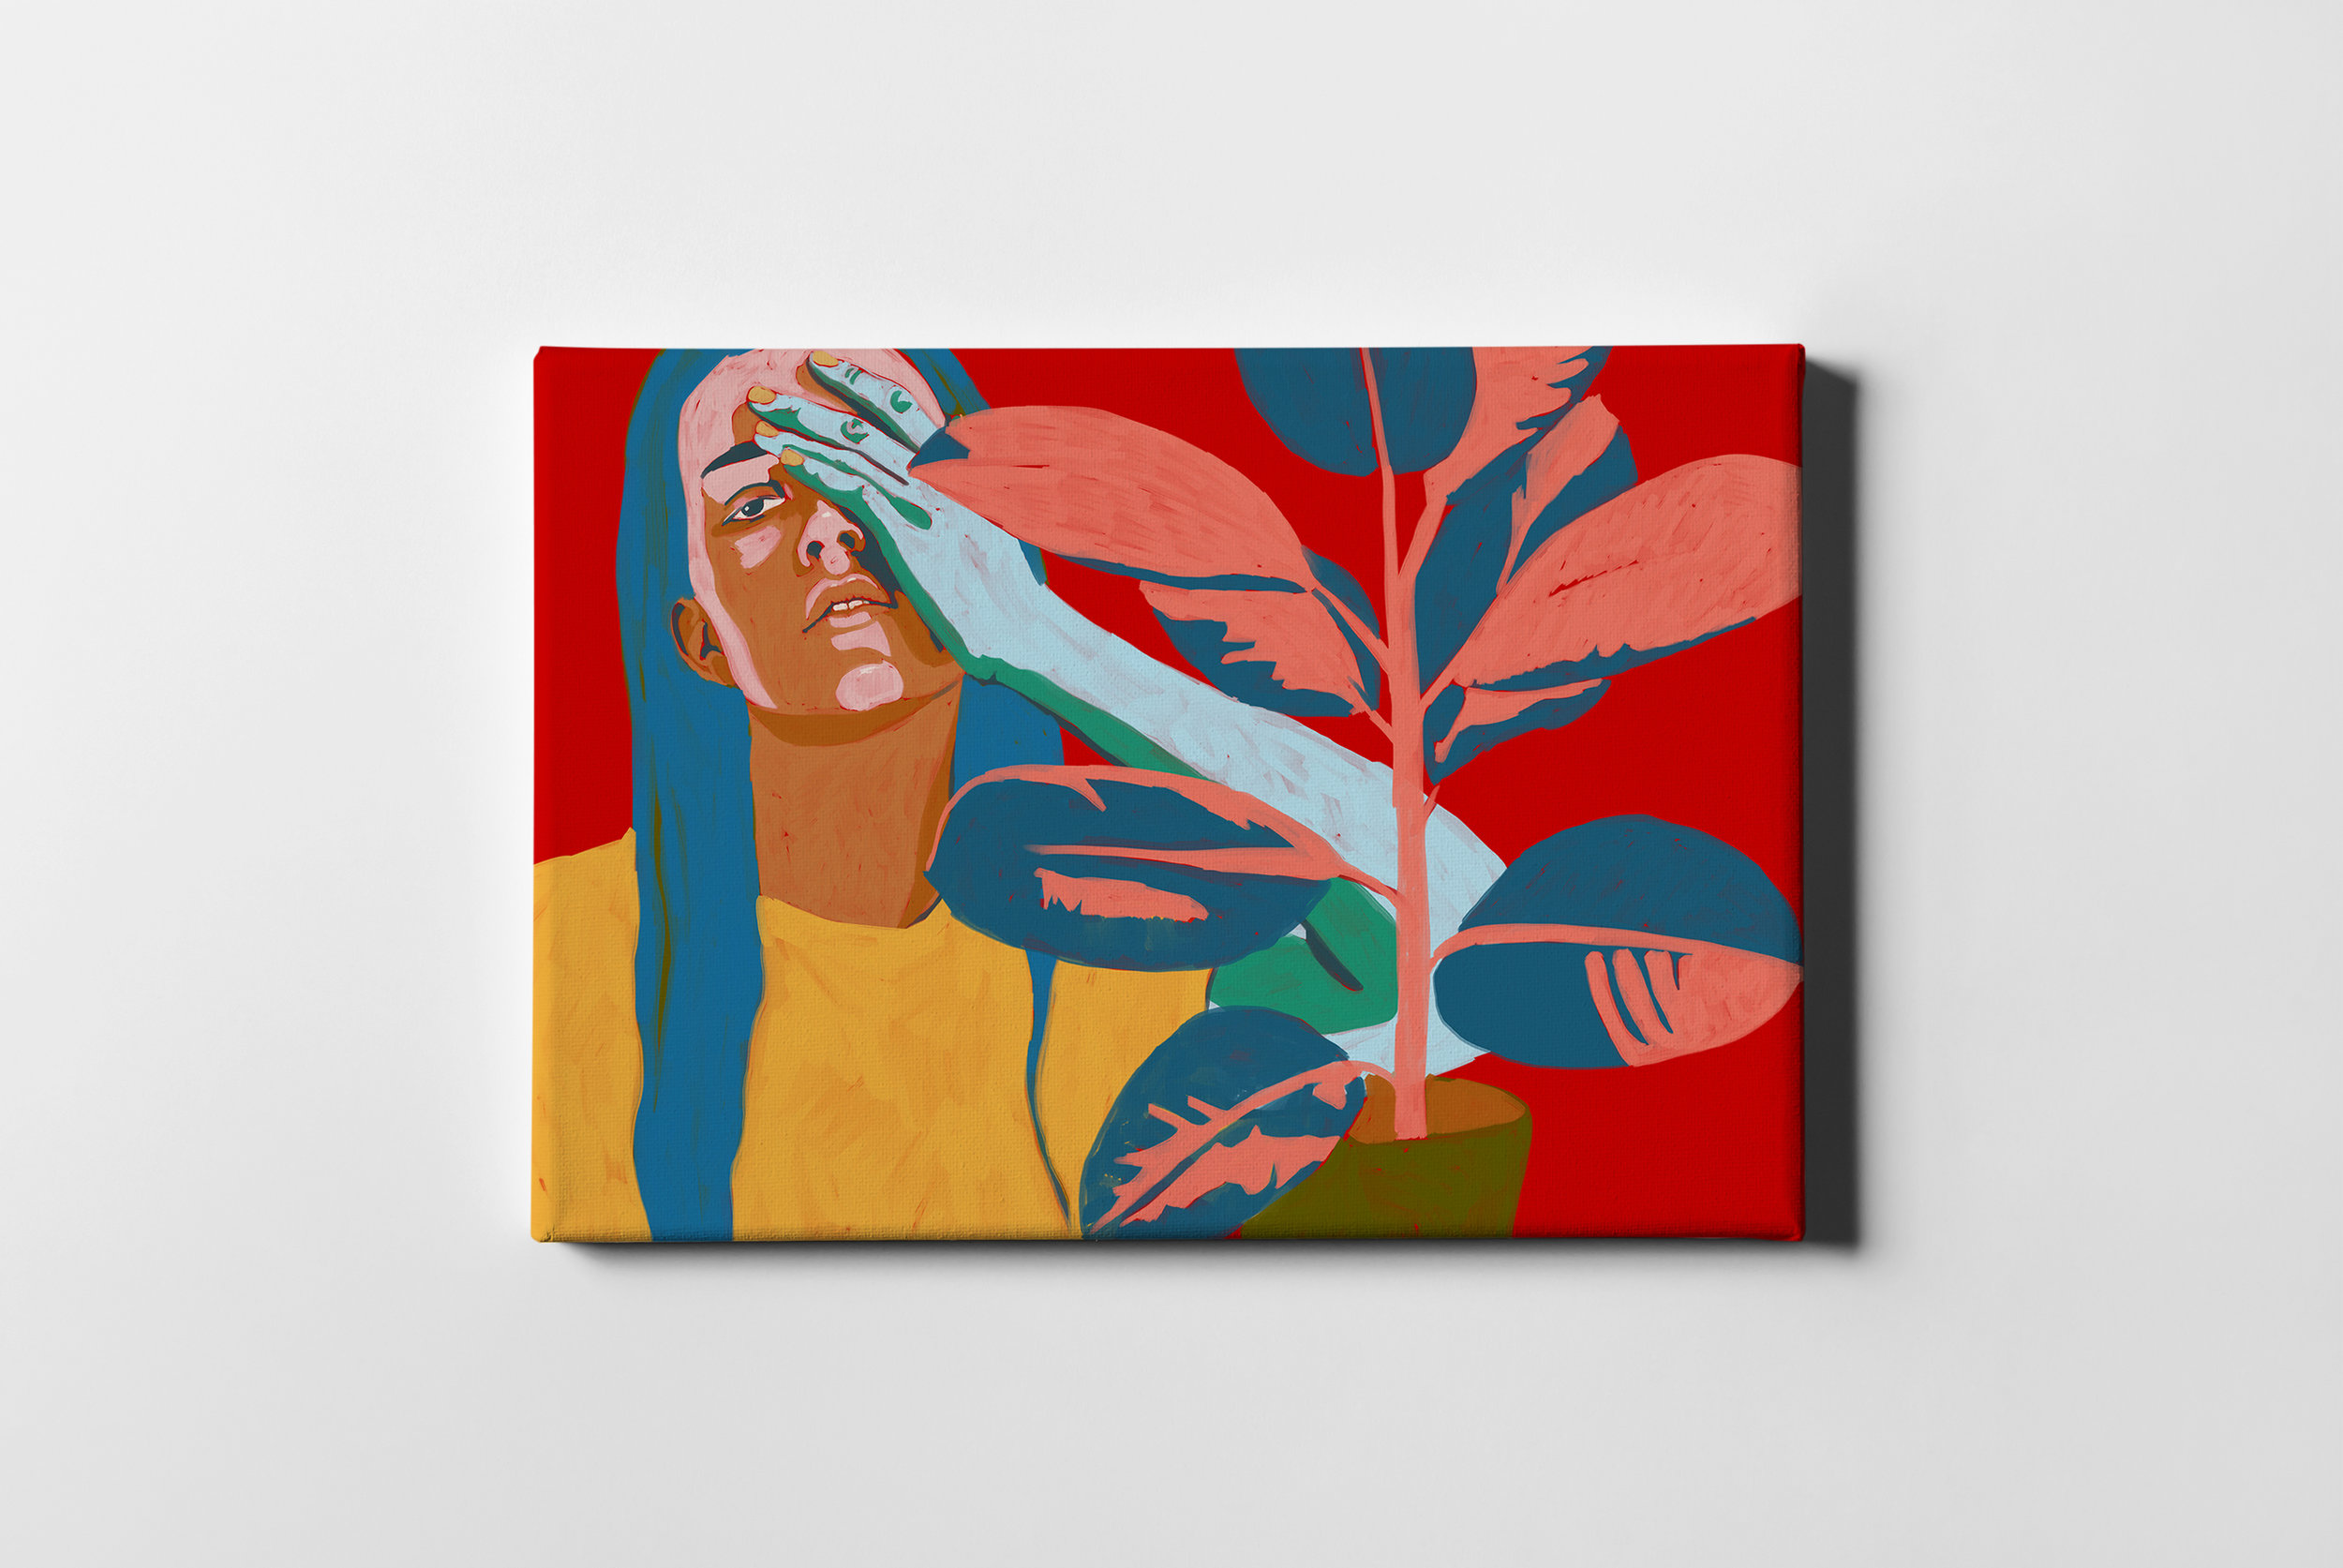 saint southwest studio / painting